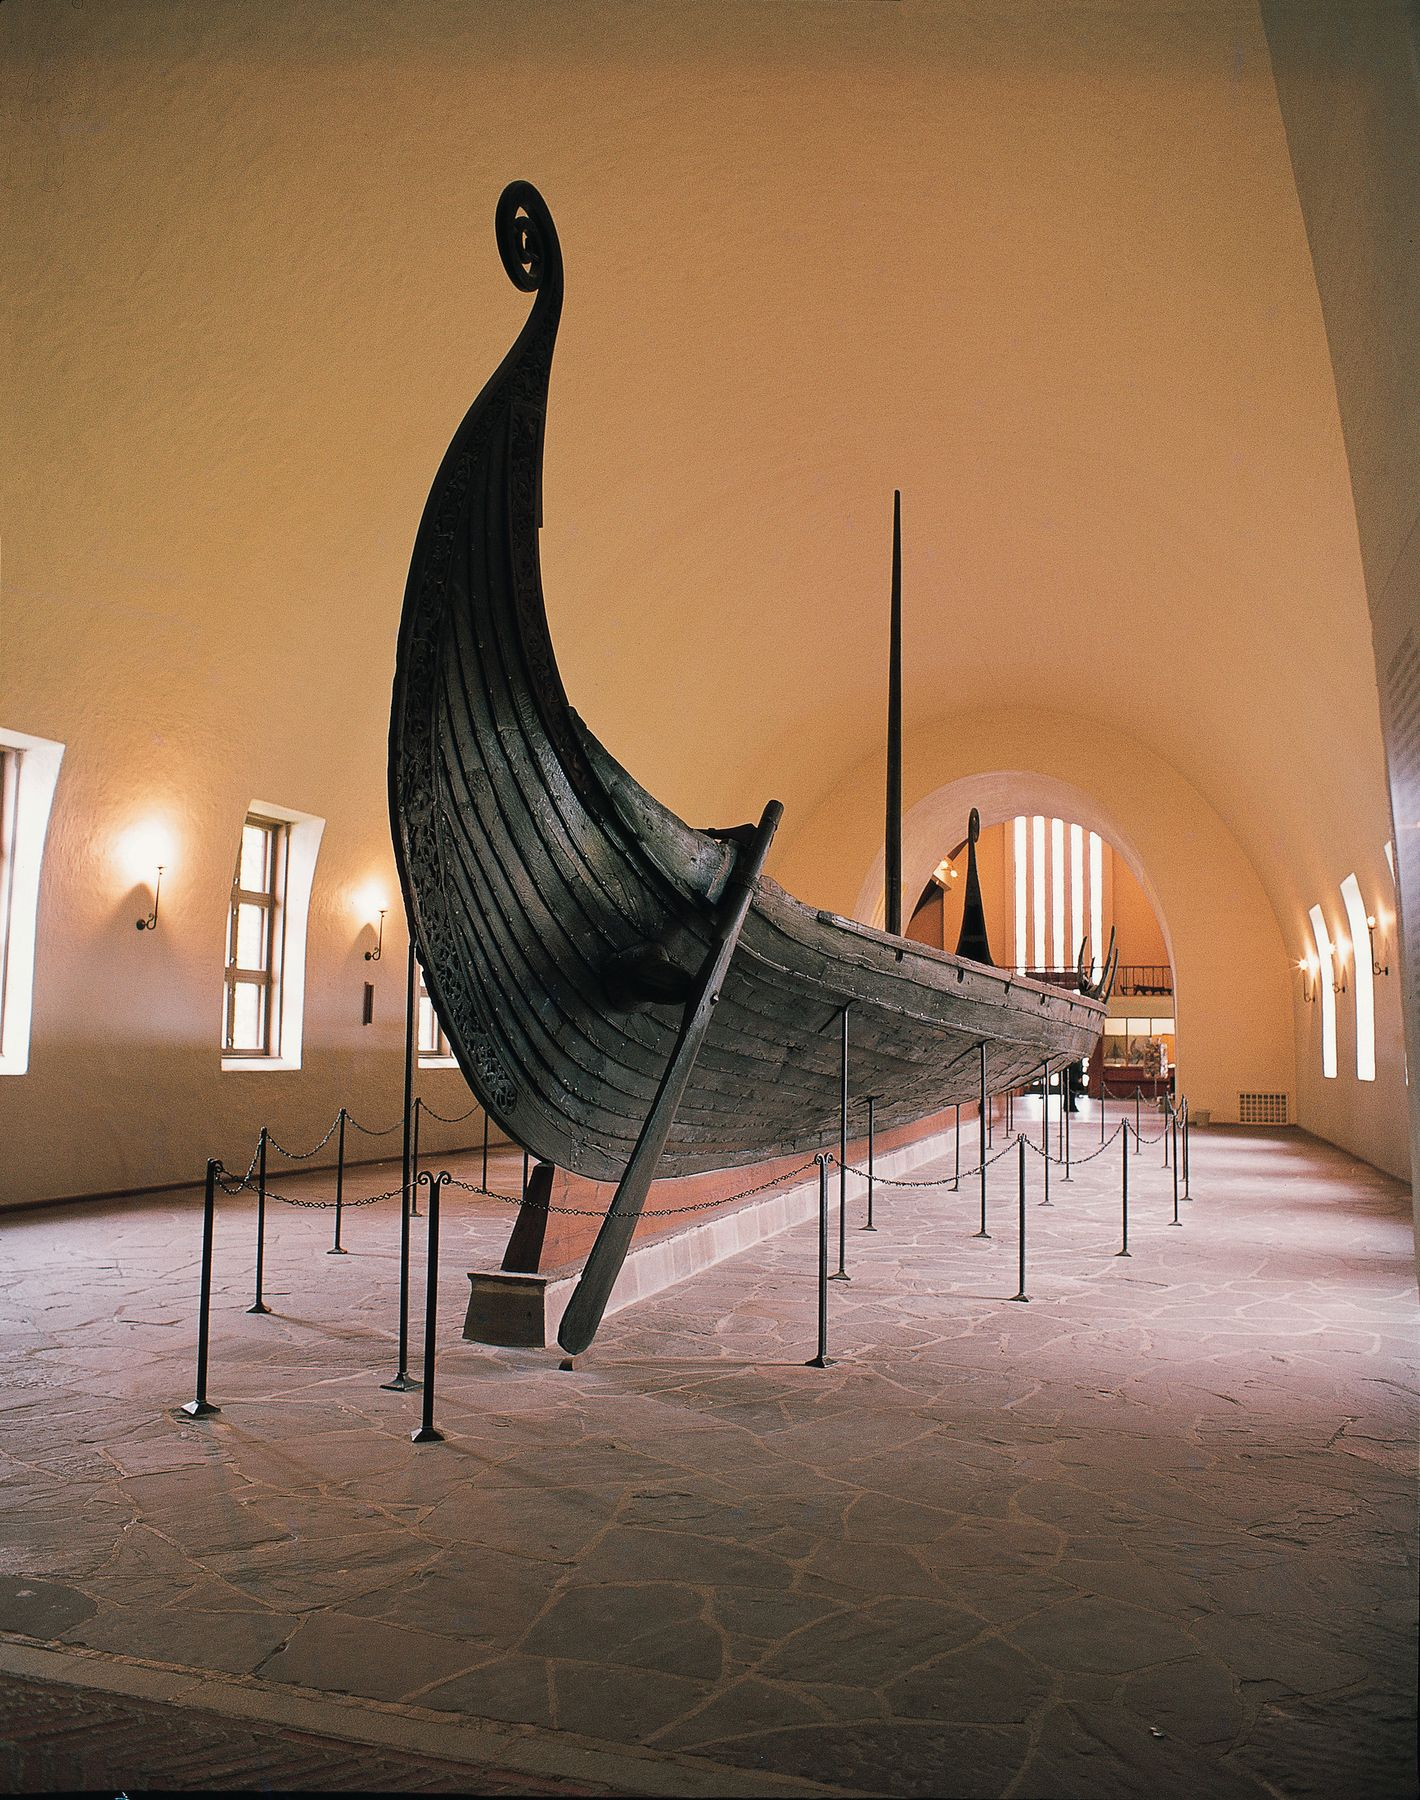 Viking ship in museum hallway